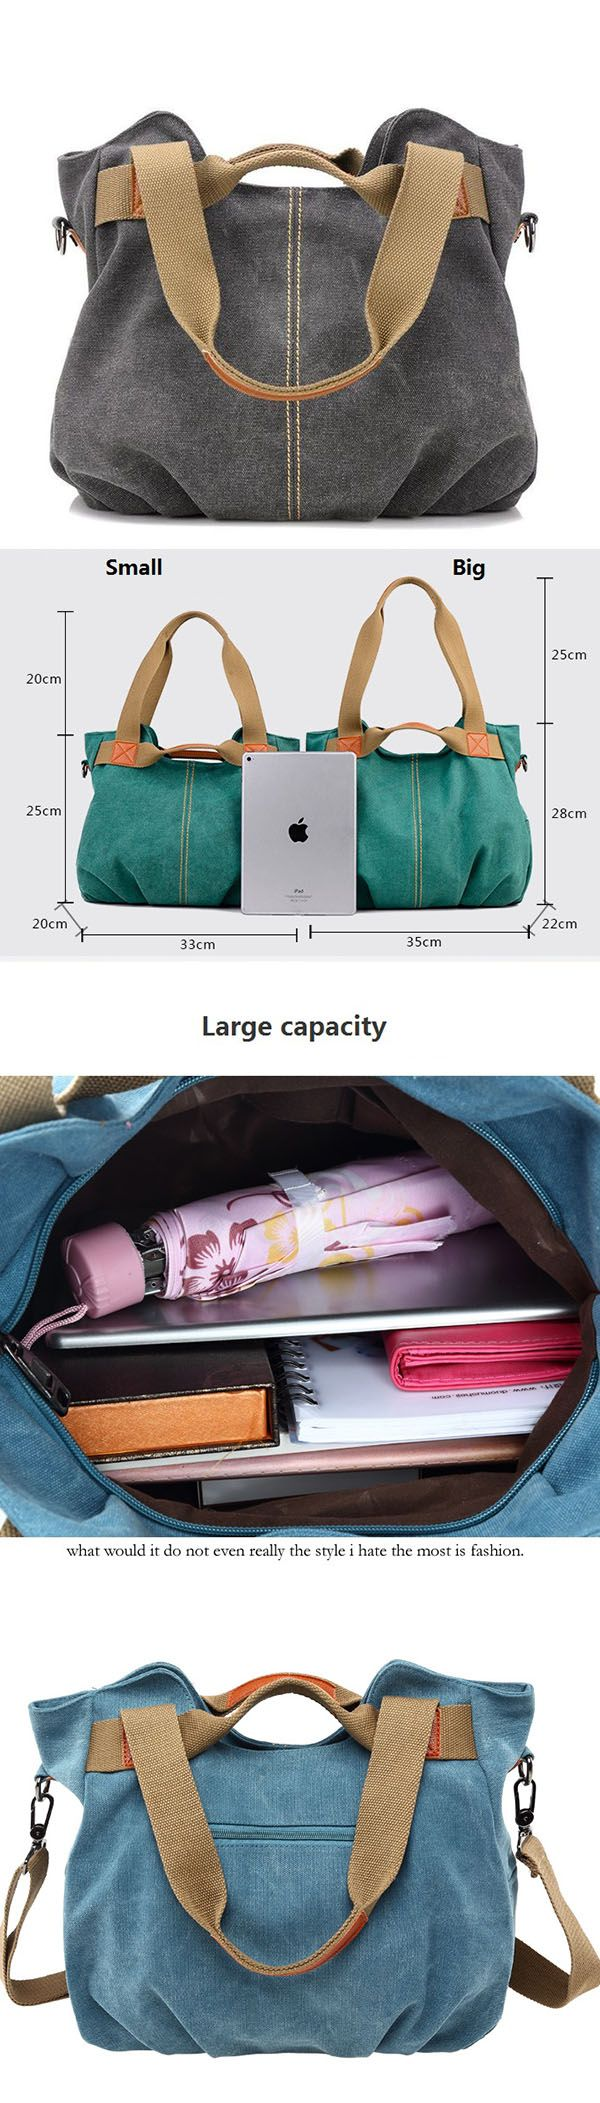 e8045ab8b8d7 Women s Vintage Canvas Shoulder Bag Purse Top-Handle Hobo Tote Handbags  Crossbody Shopping Bags